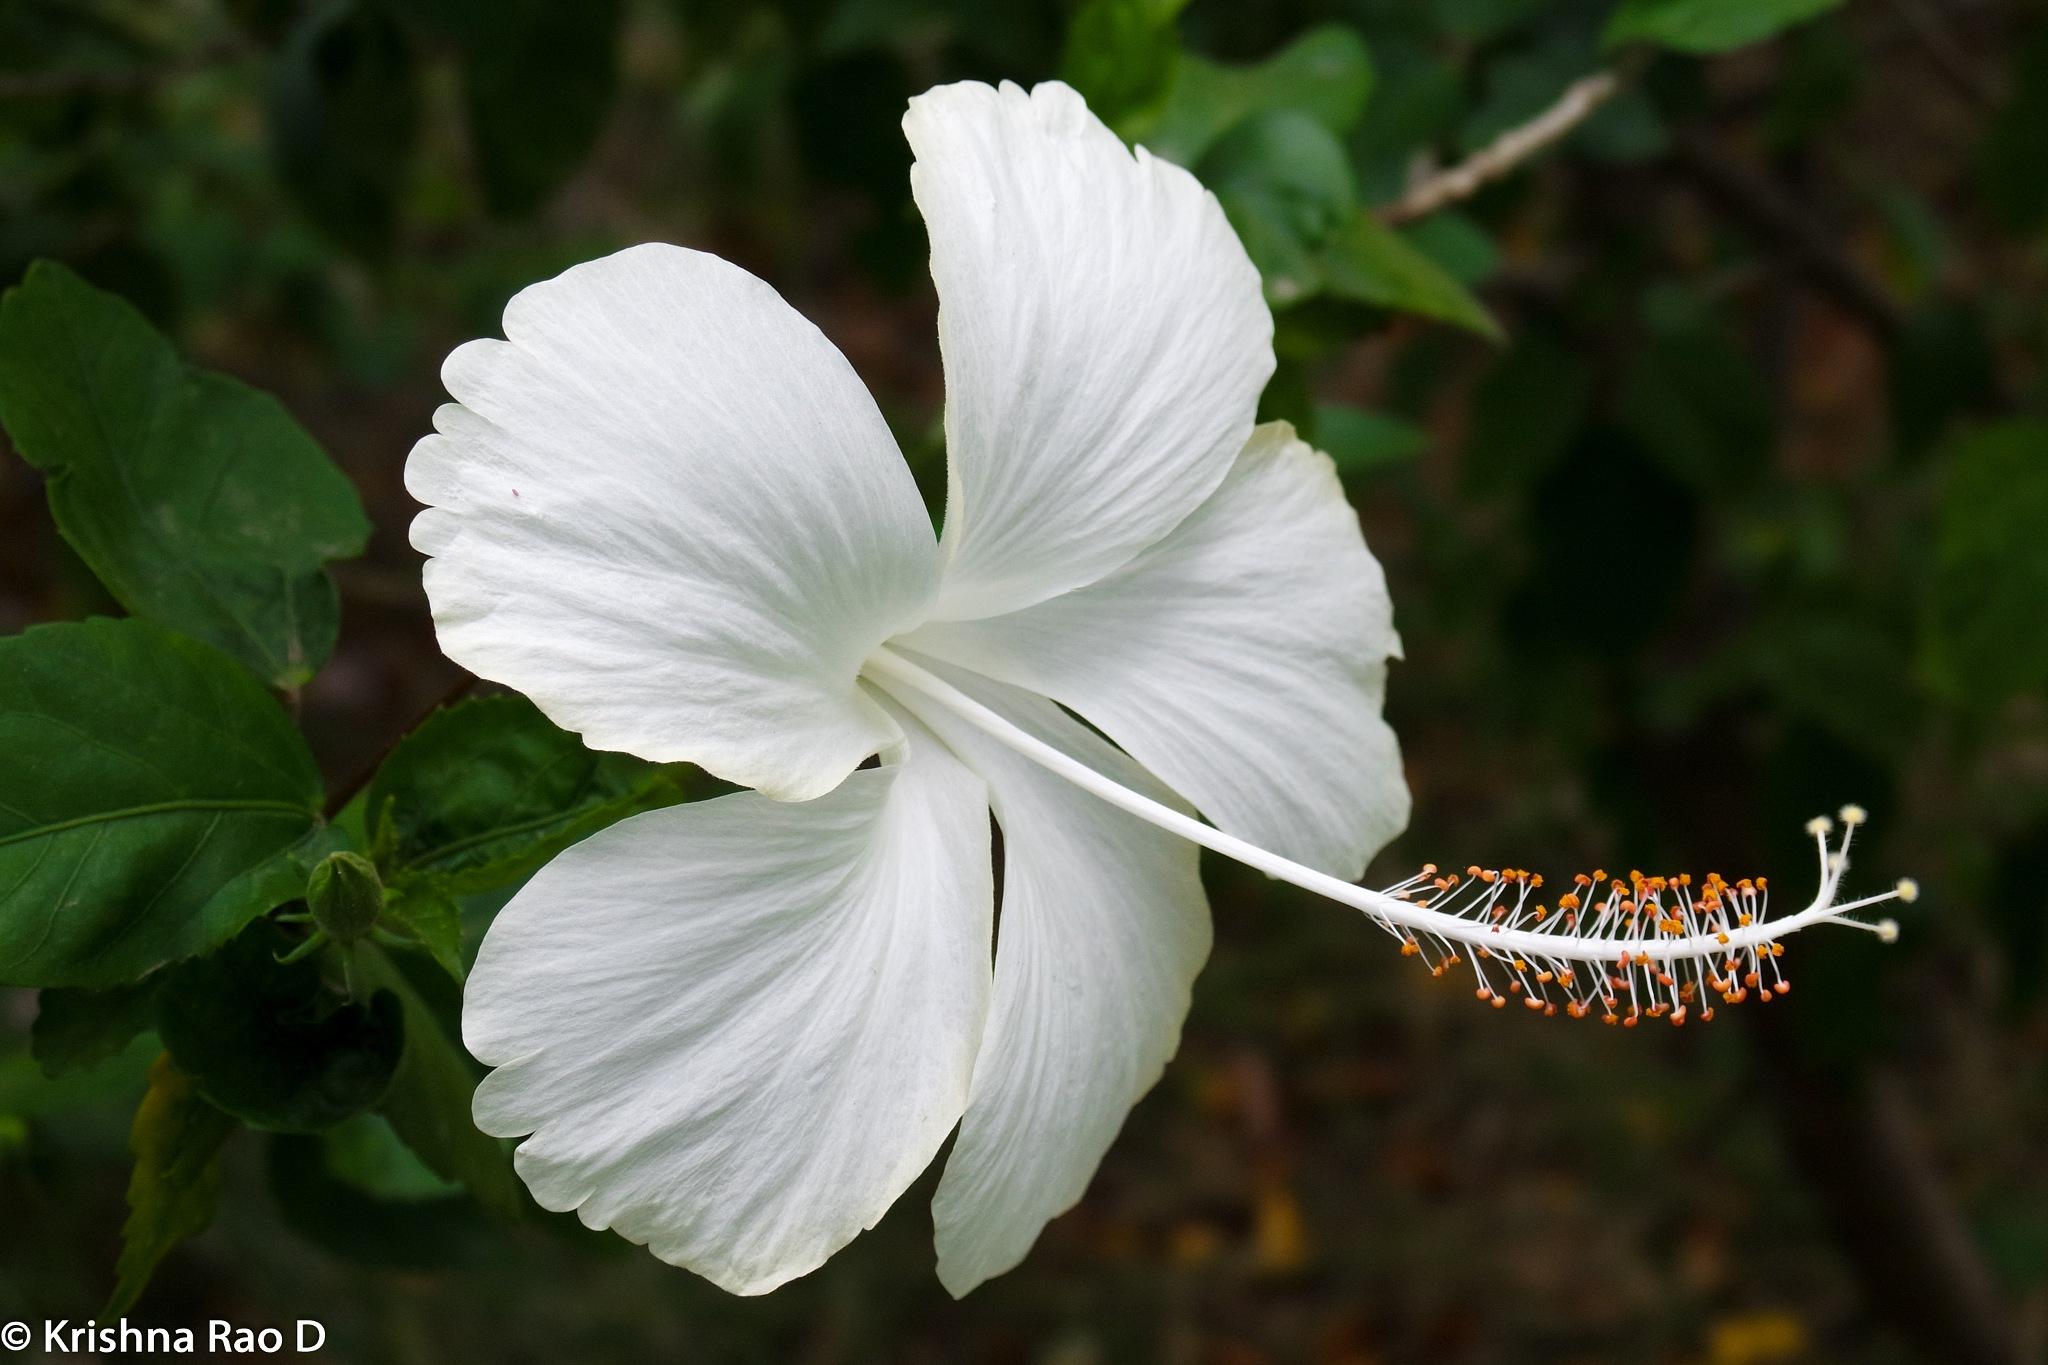 hibiscus flower by Krishna Rao D